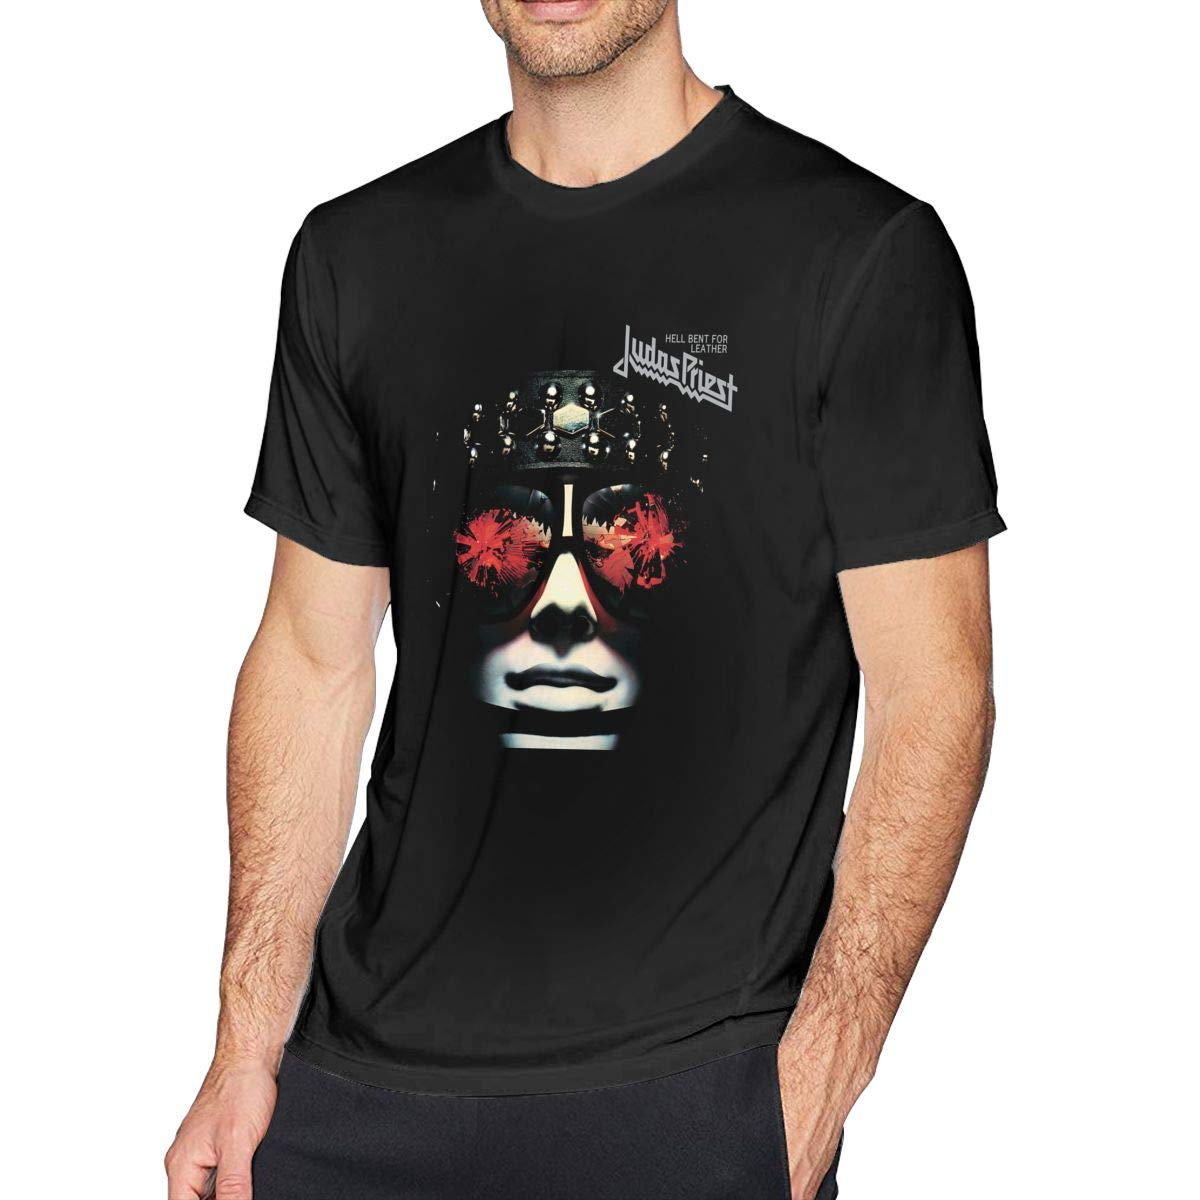 Catherine B Rosa Judas Priest Killing Machine Music Theme Sports Men's Short Sleeve T-Shirt